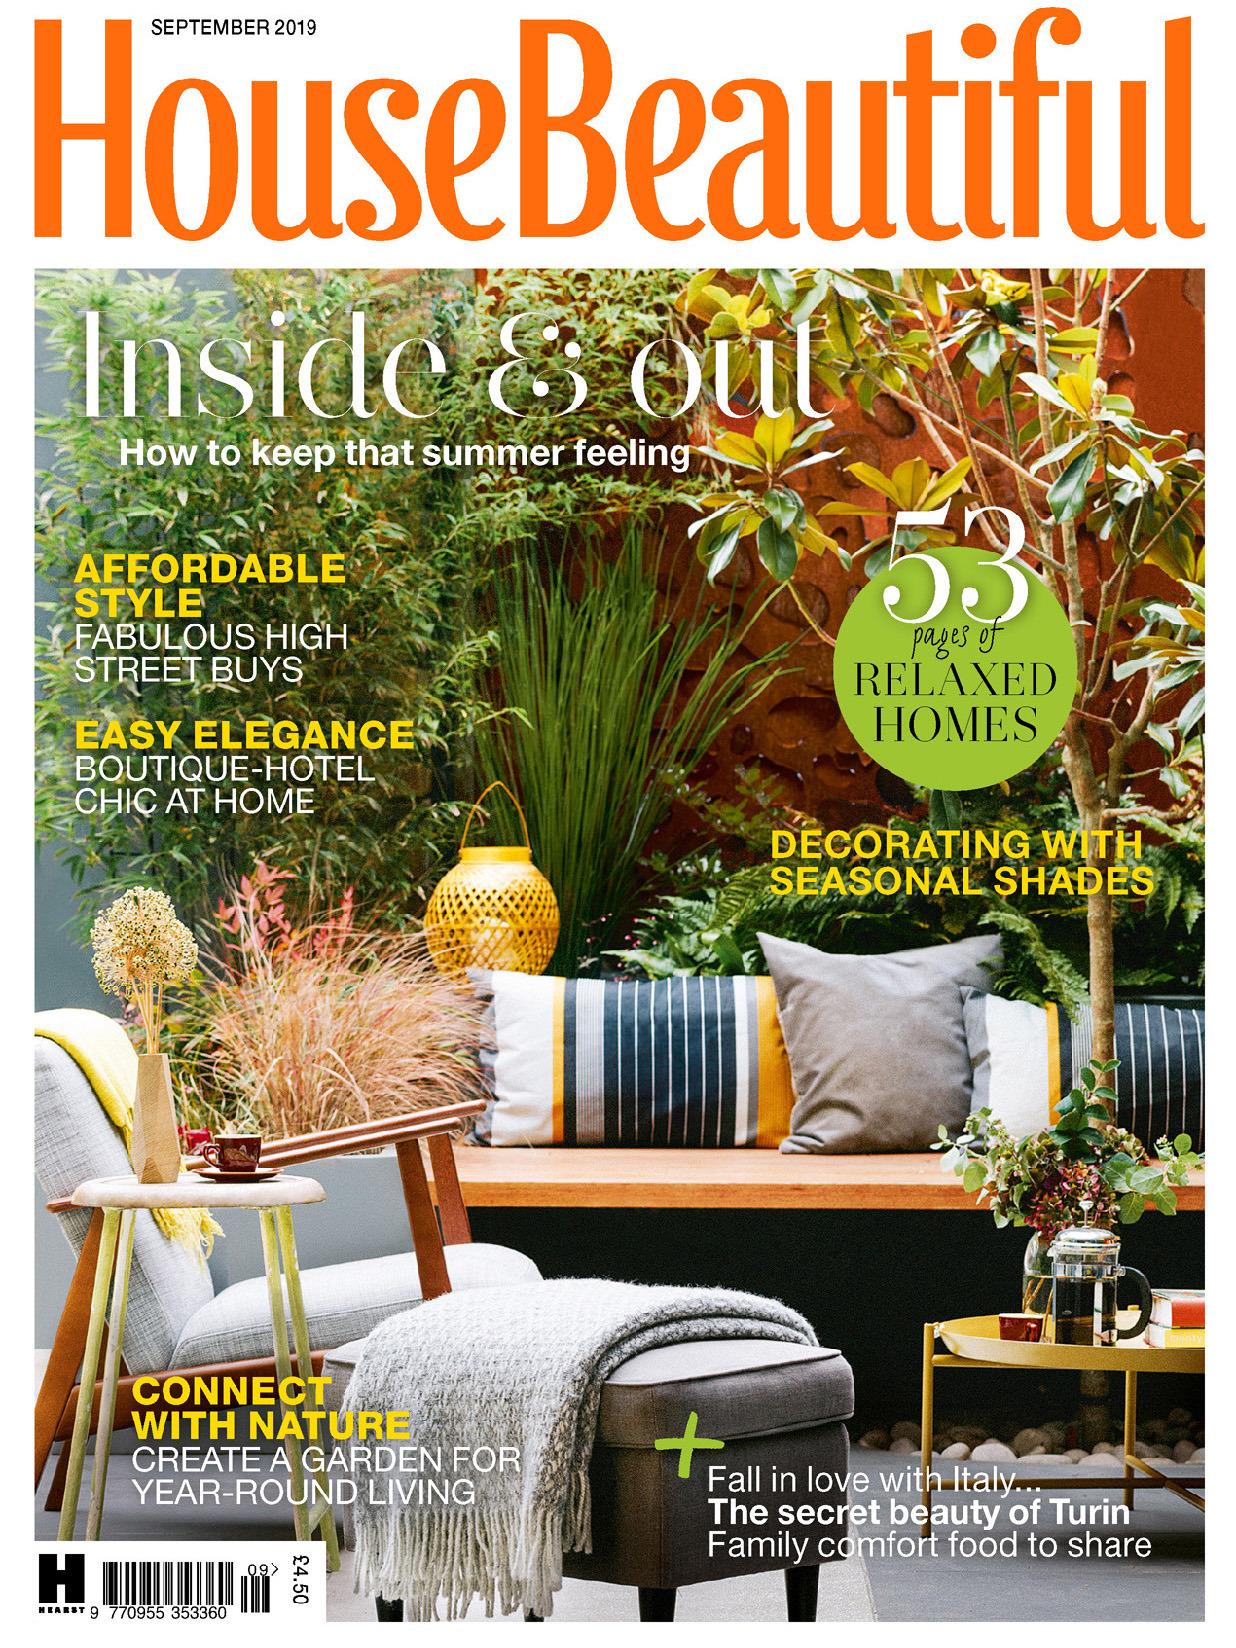 《House Beautiful》英国版时尚家居设计杂志2019年09月号